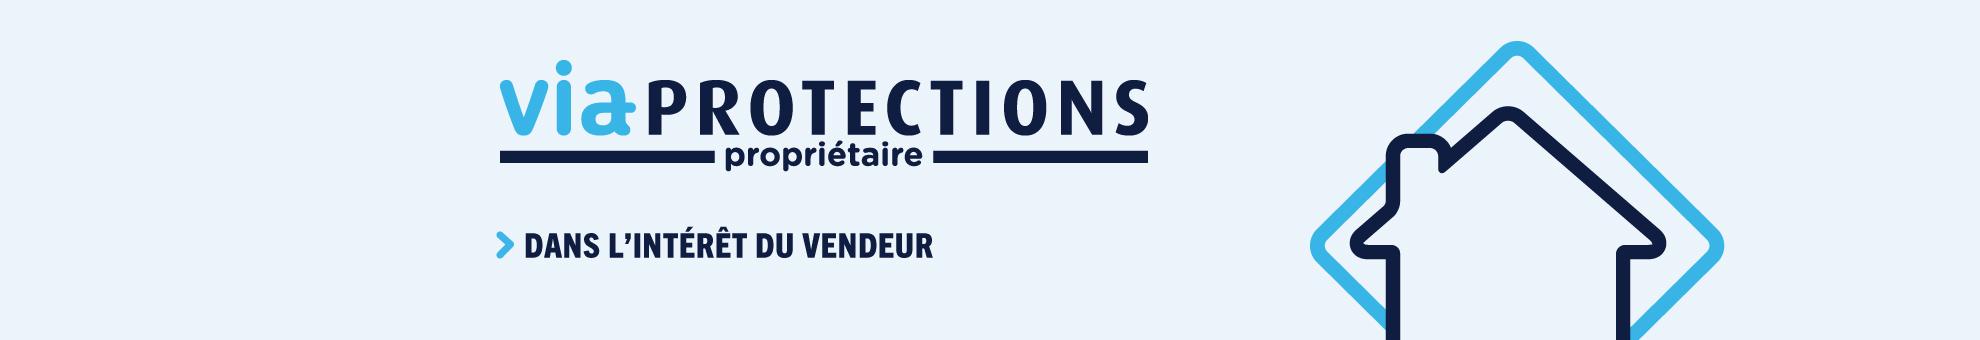 protection-proprietaire_fr-bandeau.jpg